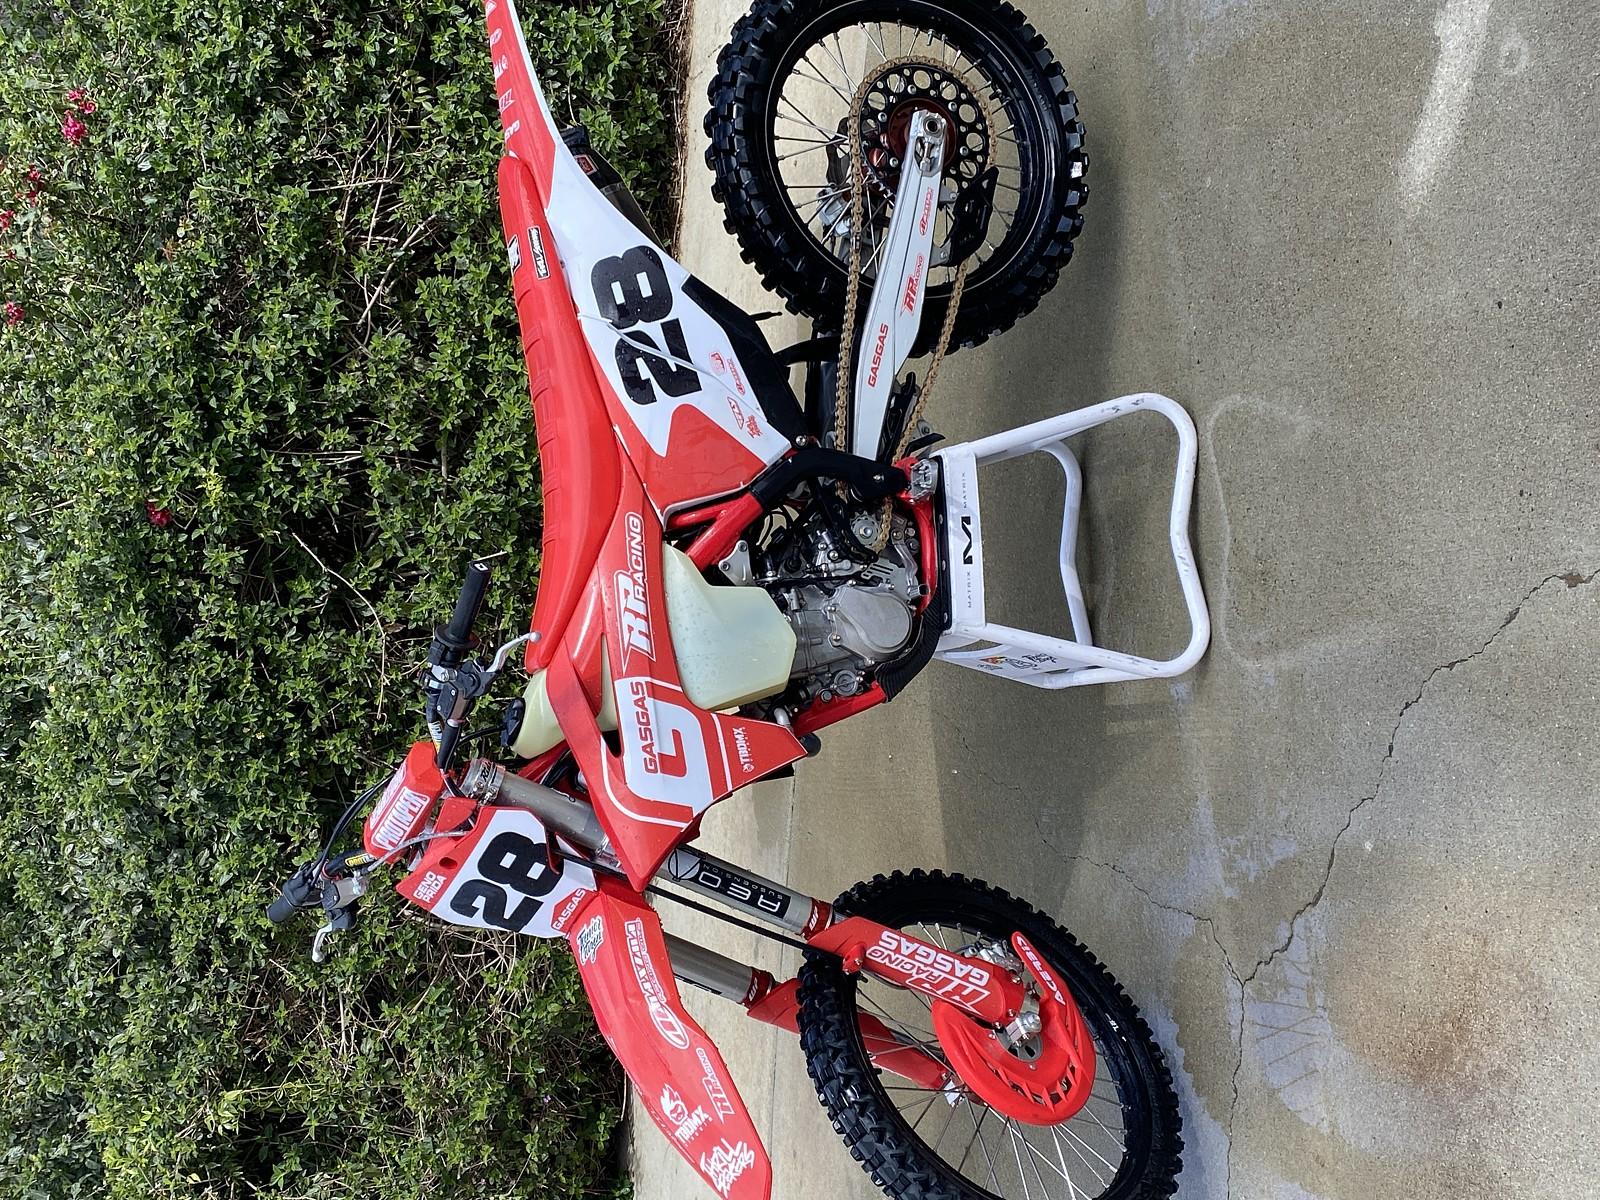 552E0EBB-9EF7-4A7F-83D6-5ECB87BF6373 - prida28 - Motocross Pictures - Vital MX